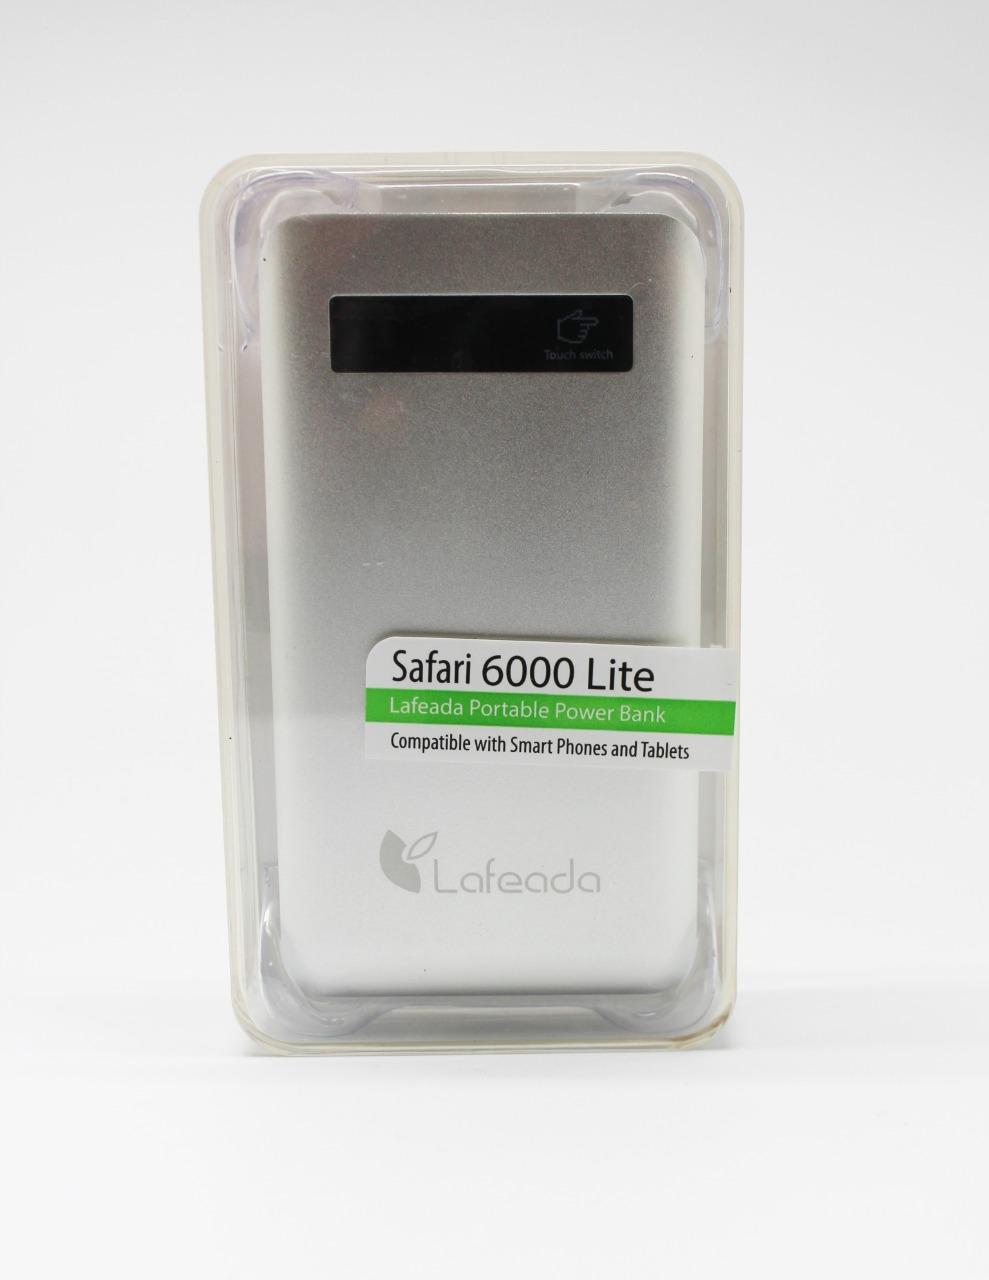 Wholesale power pack : safari 6000 lite, black, universal power bank